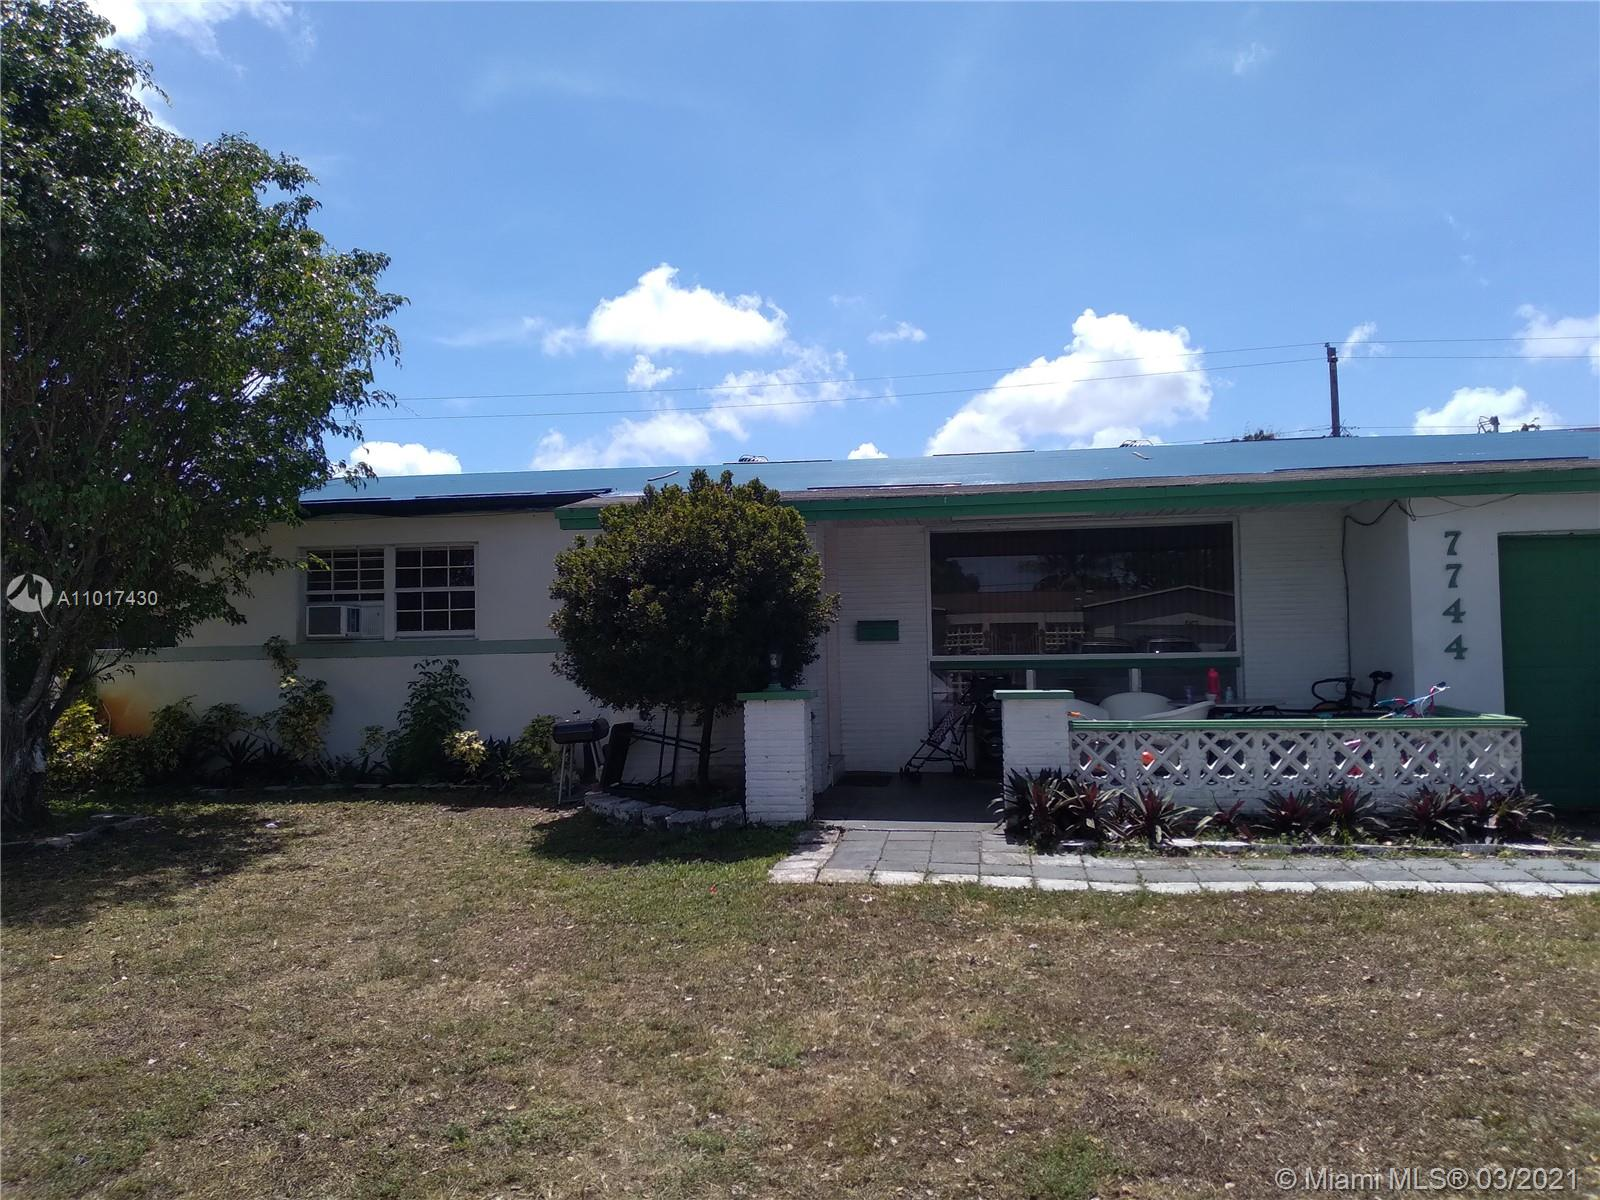 Miramar Park - 7744 Dilido Blvd, Miramar, FL 33023